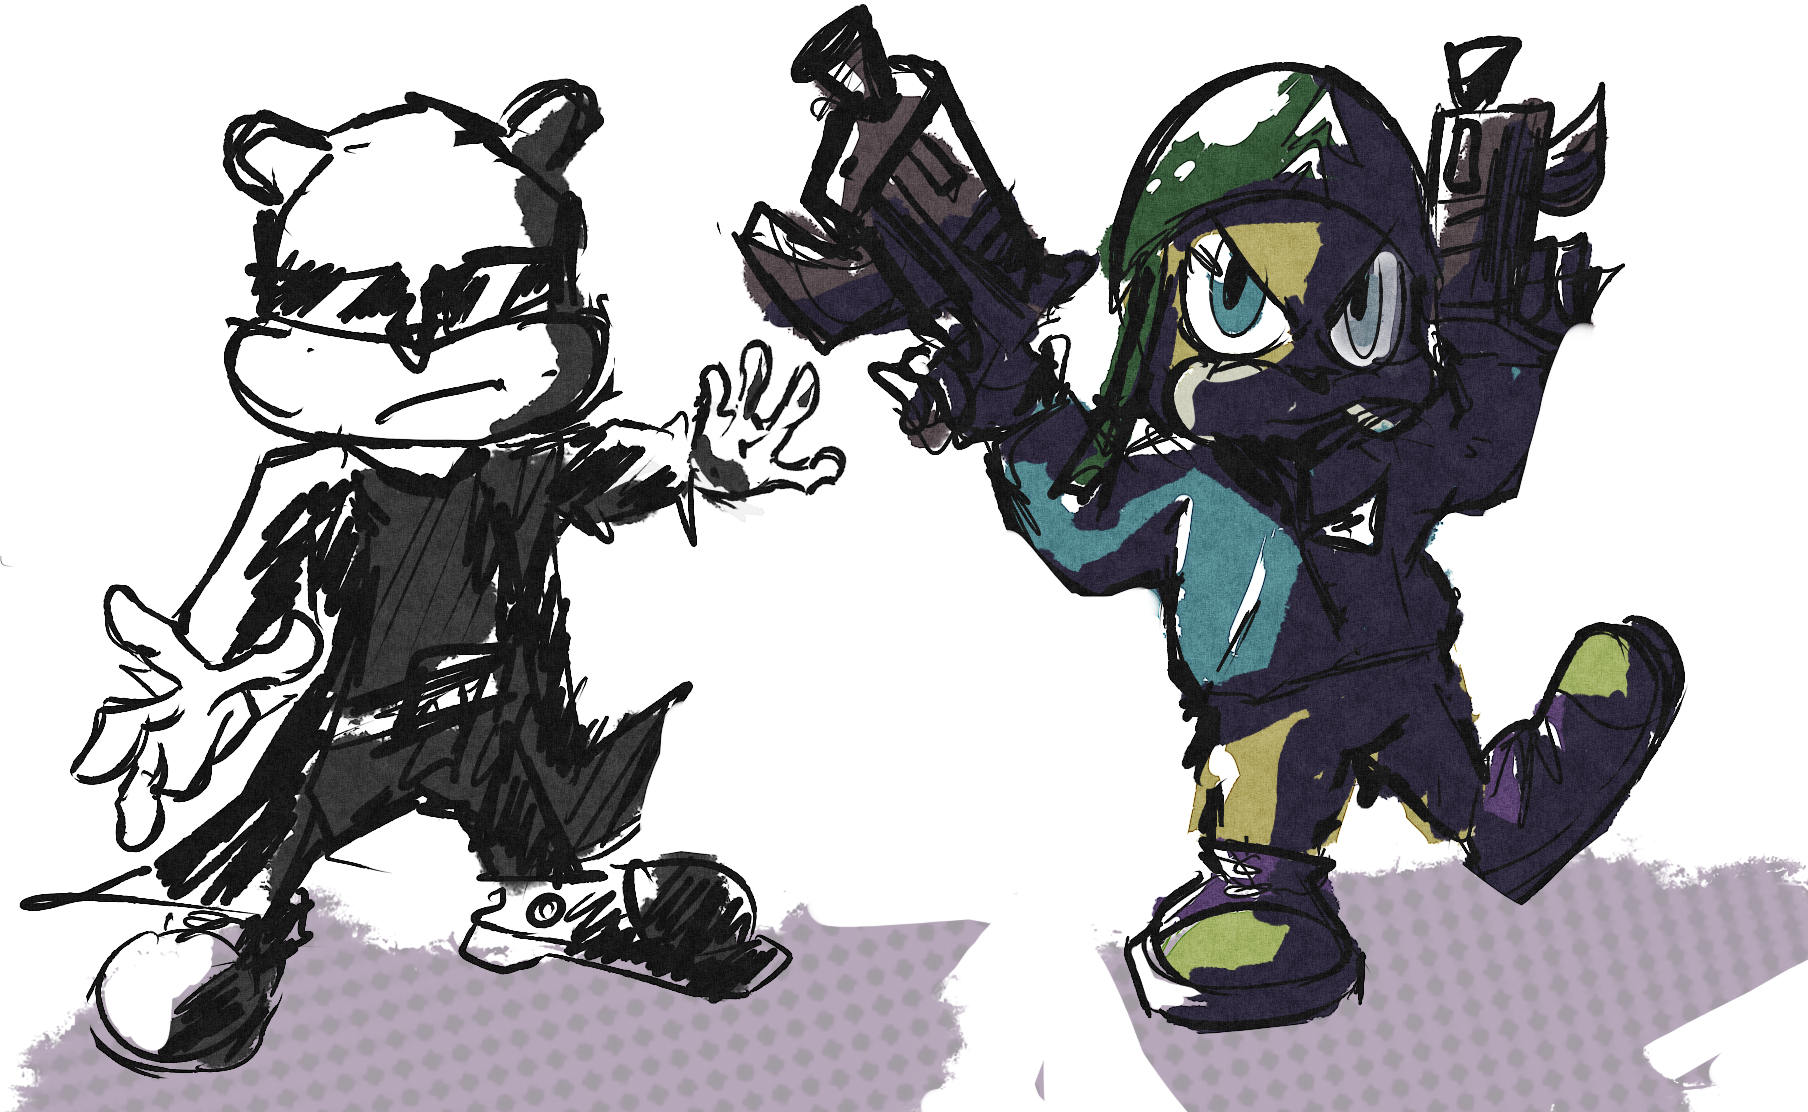 even more random schtuff ive drawn